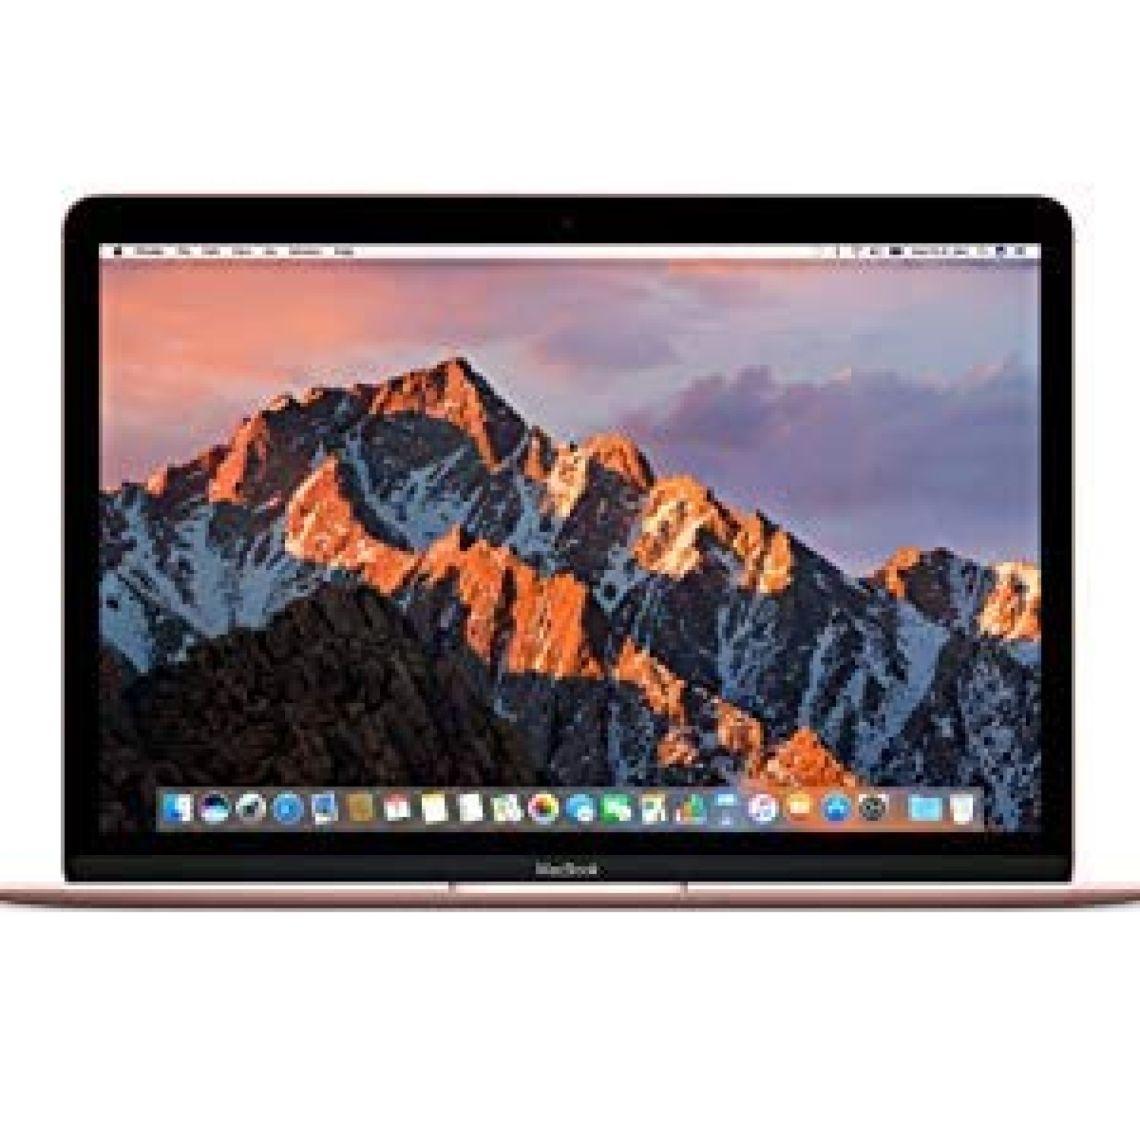 "Amazon.com: Apple MacBook (Mid 2017) 12"" Laptop, 226ppi, Intel Core M3-7Y32 Dual-Core, 256GB, 8GB DDR3, 802.11ac, Bluetooth, macOS 10.12.5 High Sierra - Gold (Refurbished): Computers & Accessories"